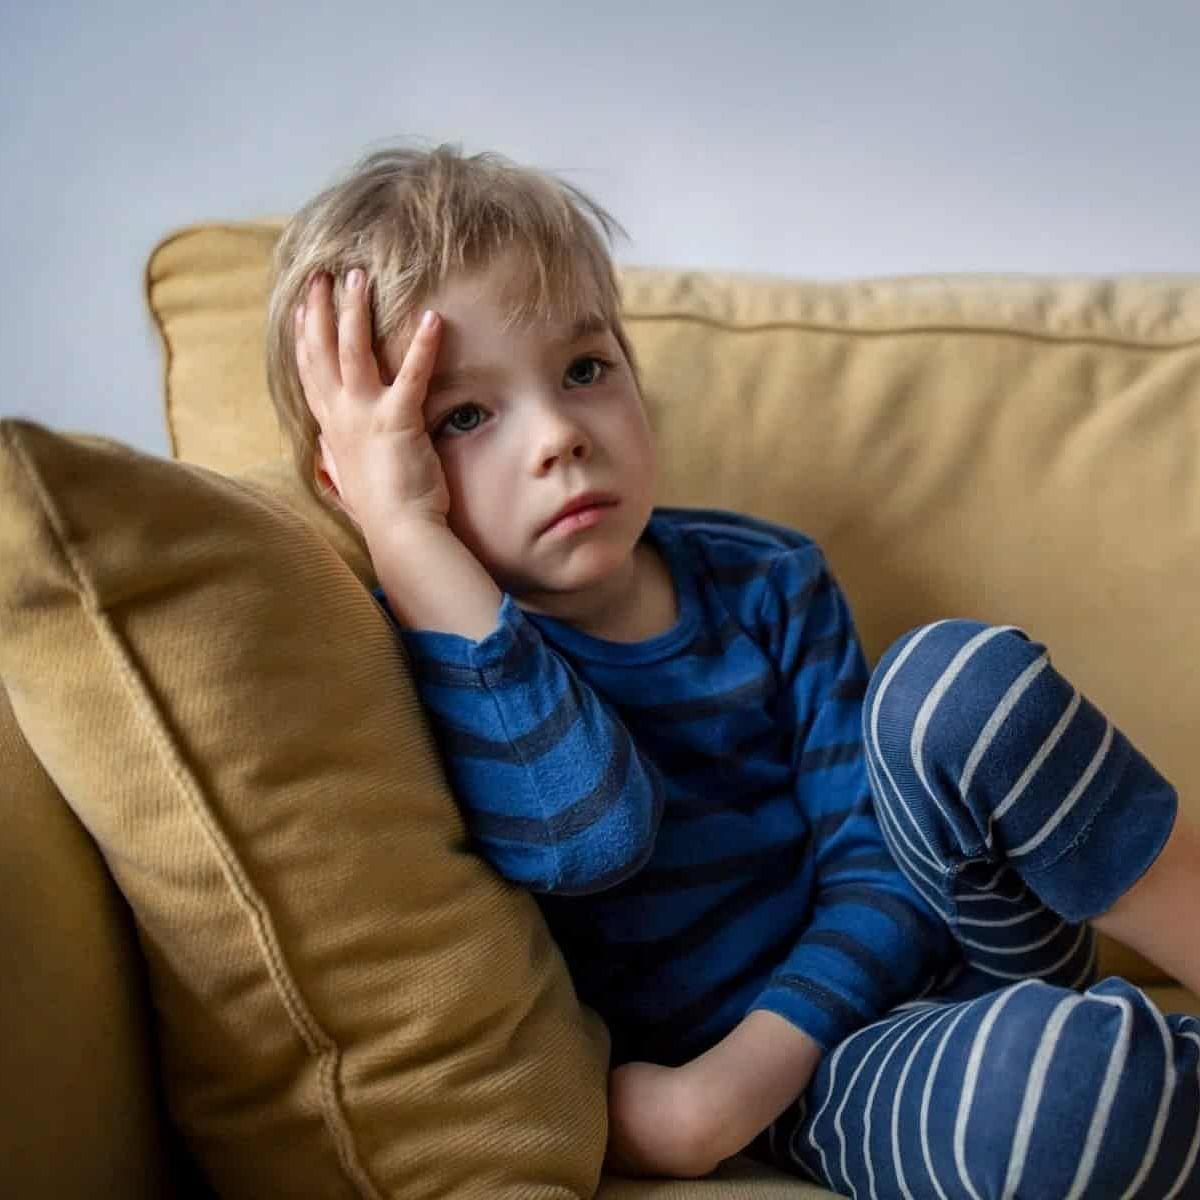 Inadequate sleep risks children's mental health